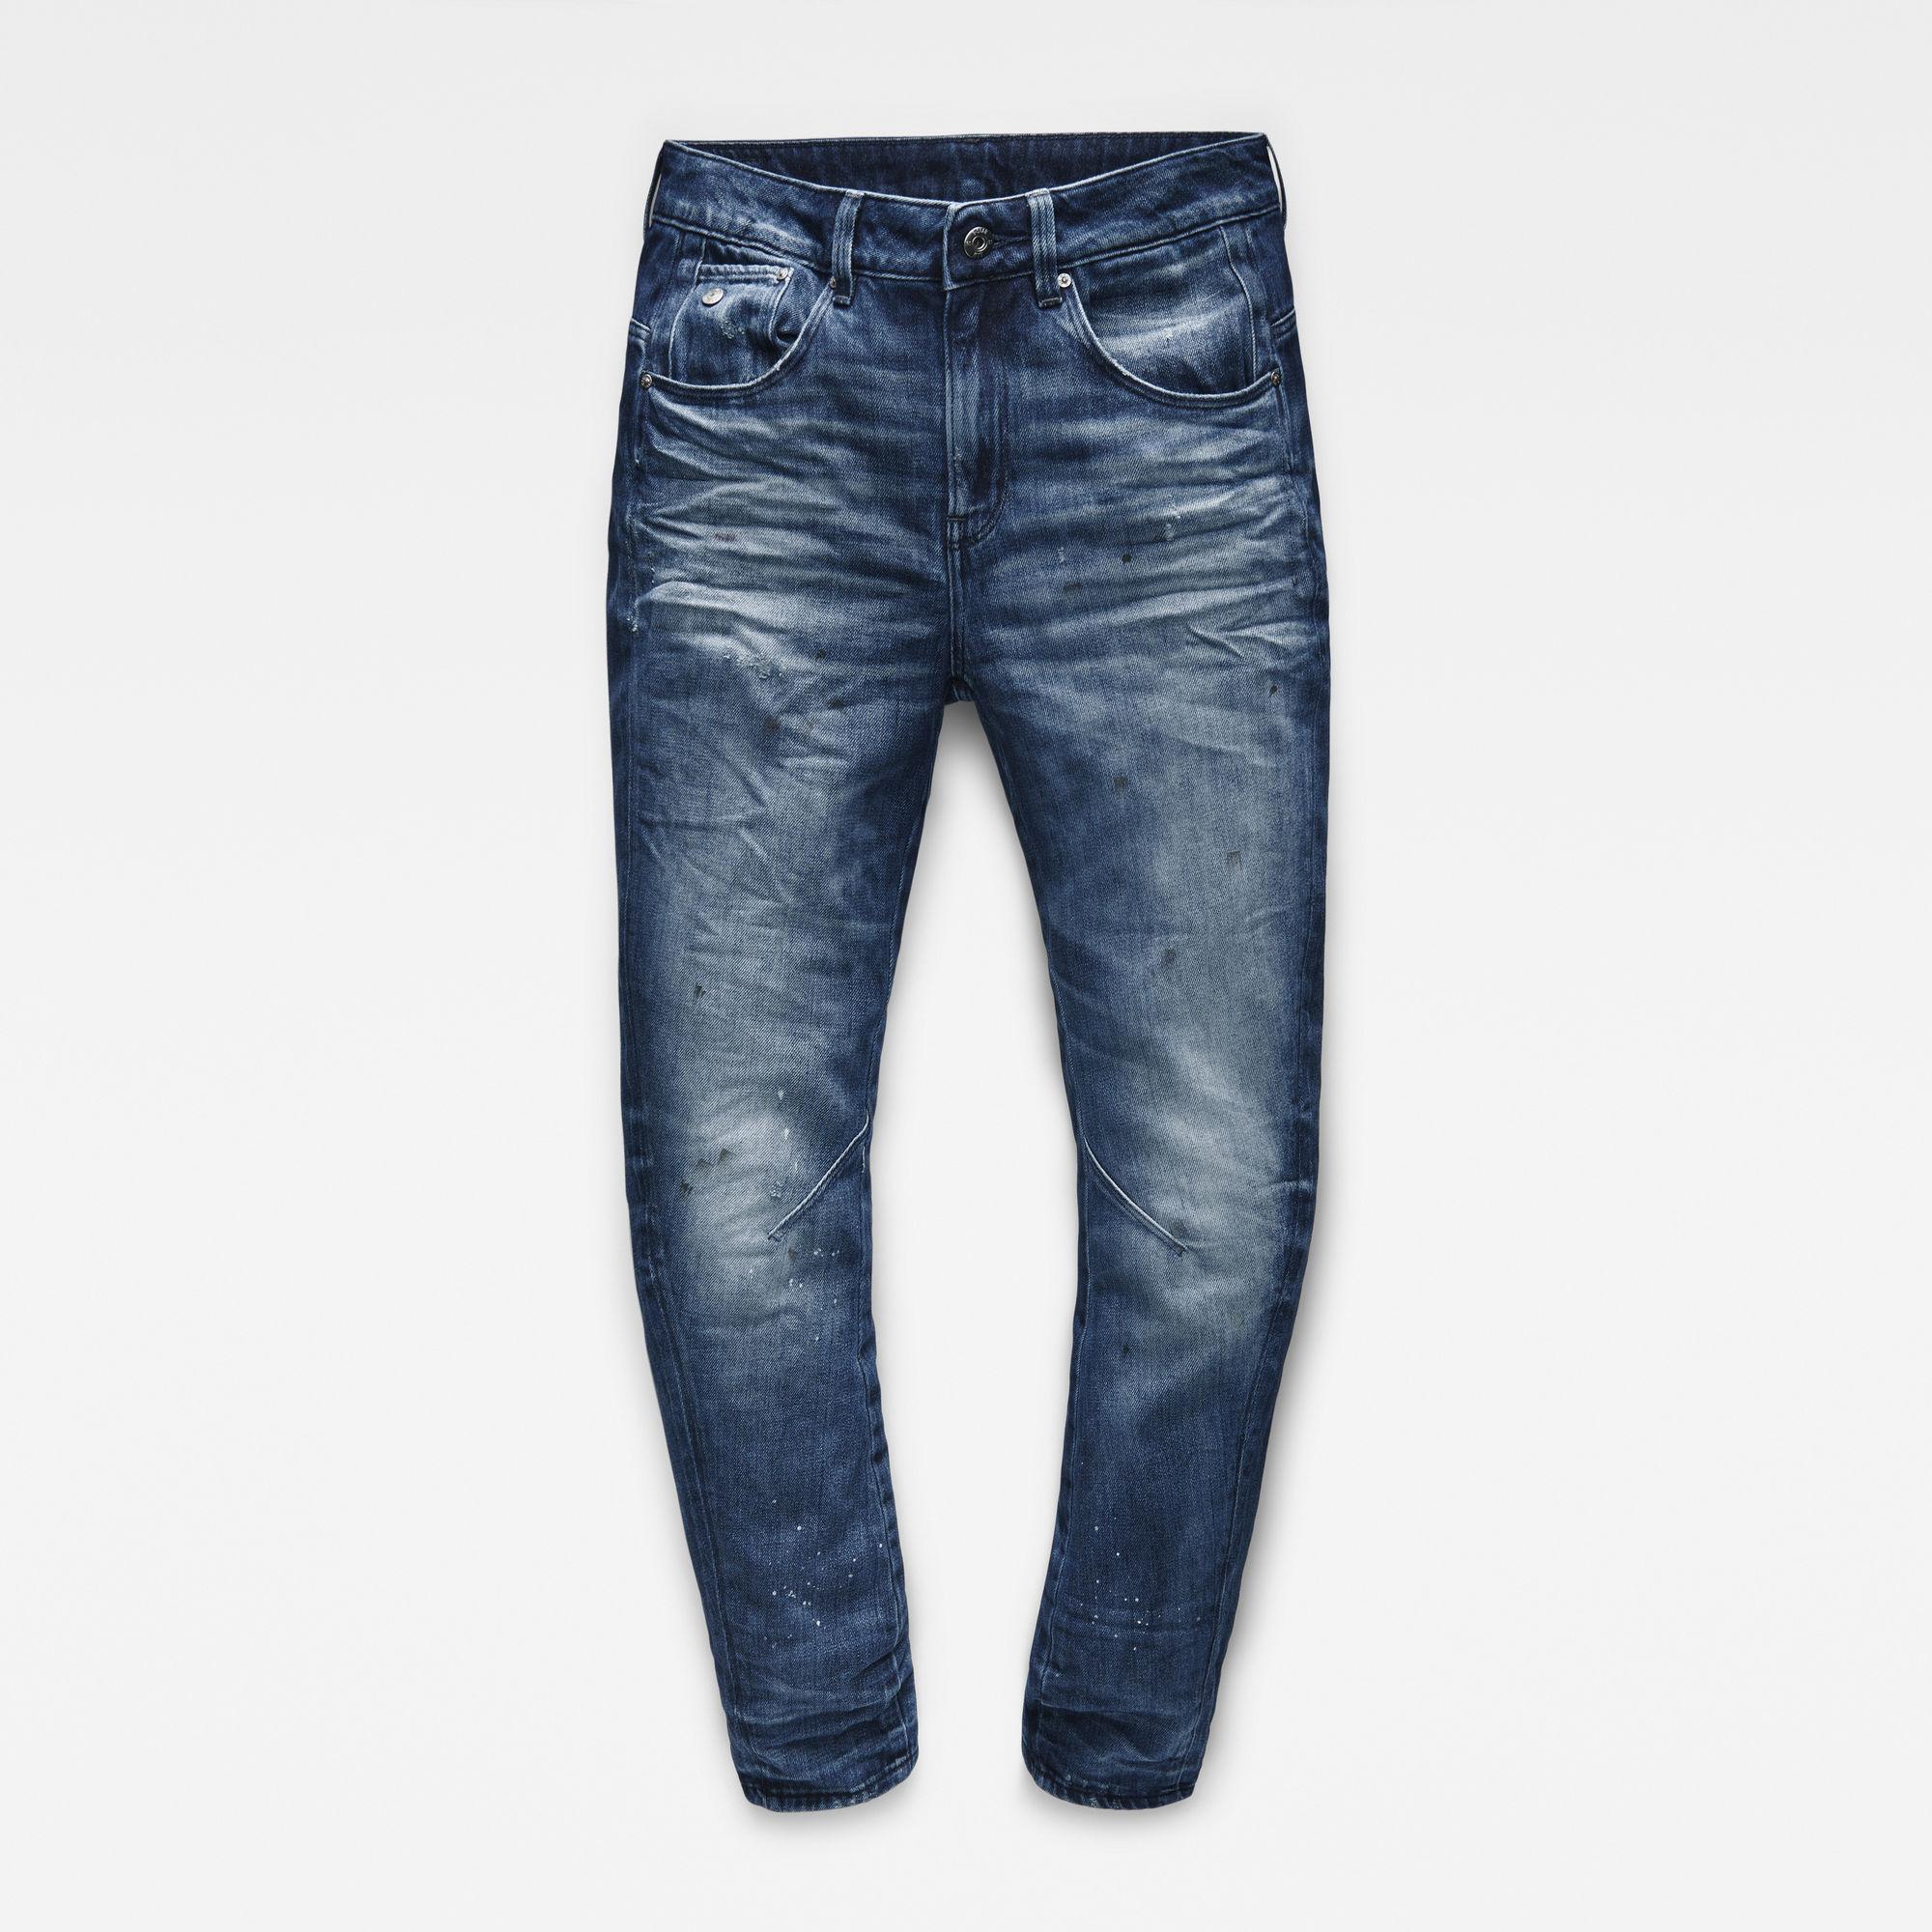 Arc 3D Mid Waist Boyfriend Jeans